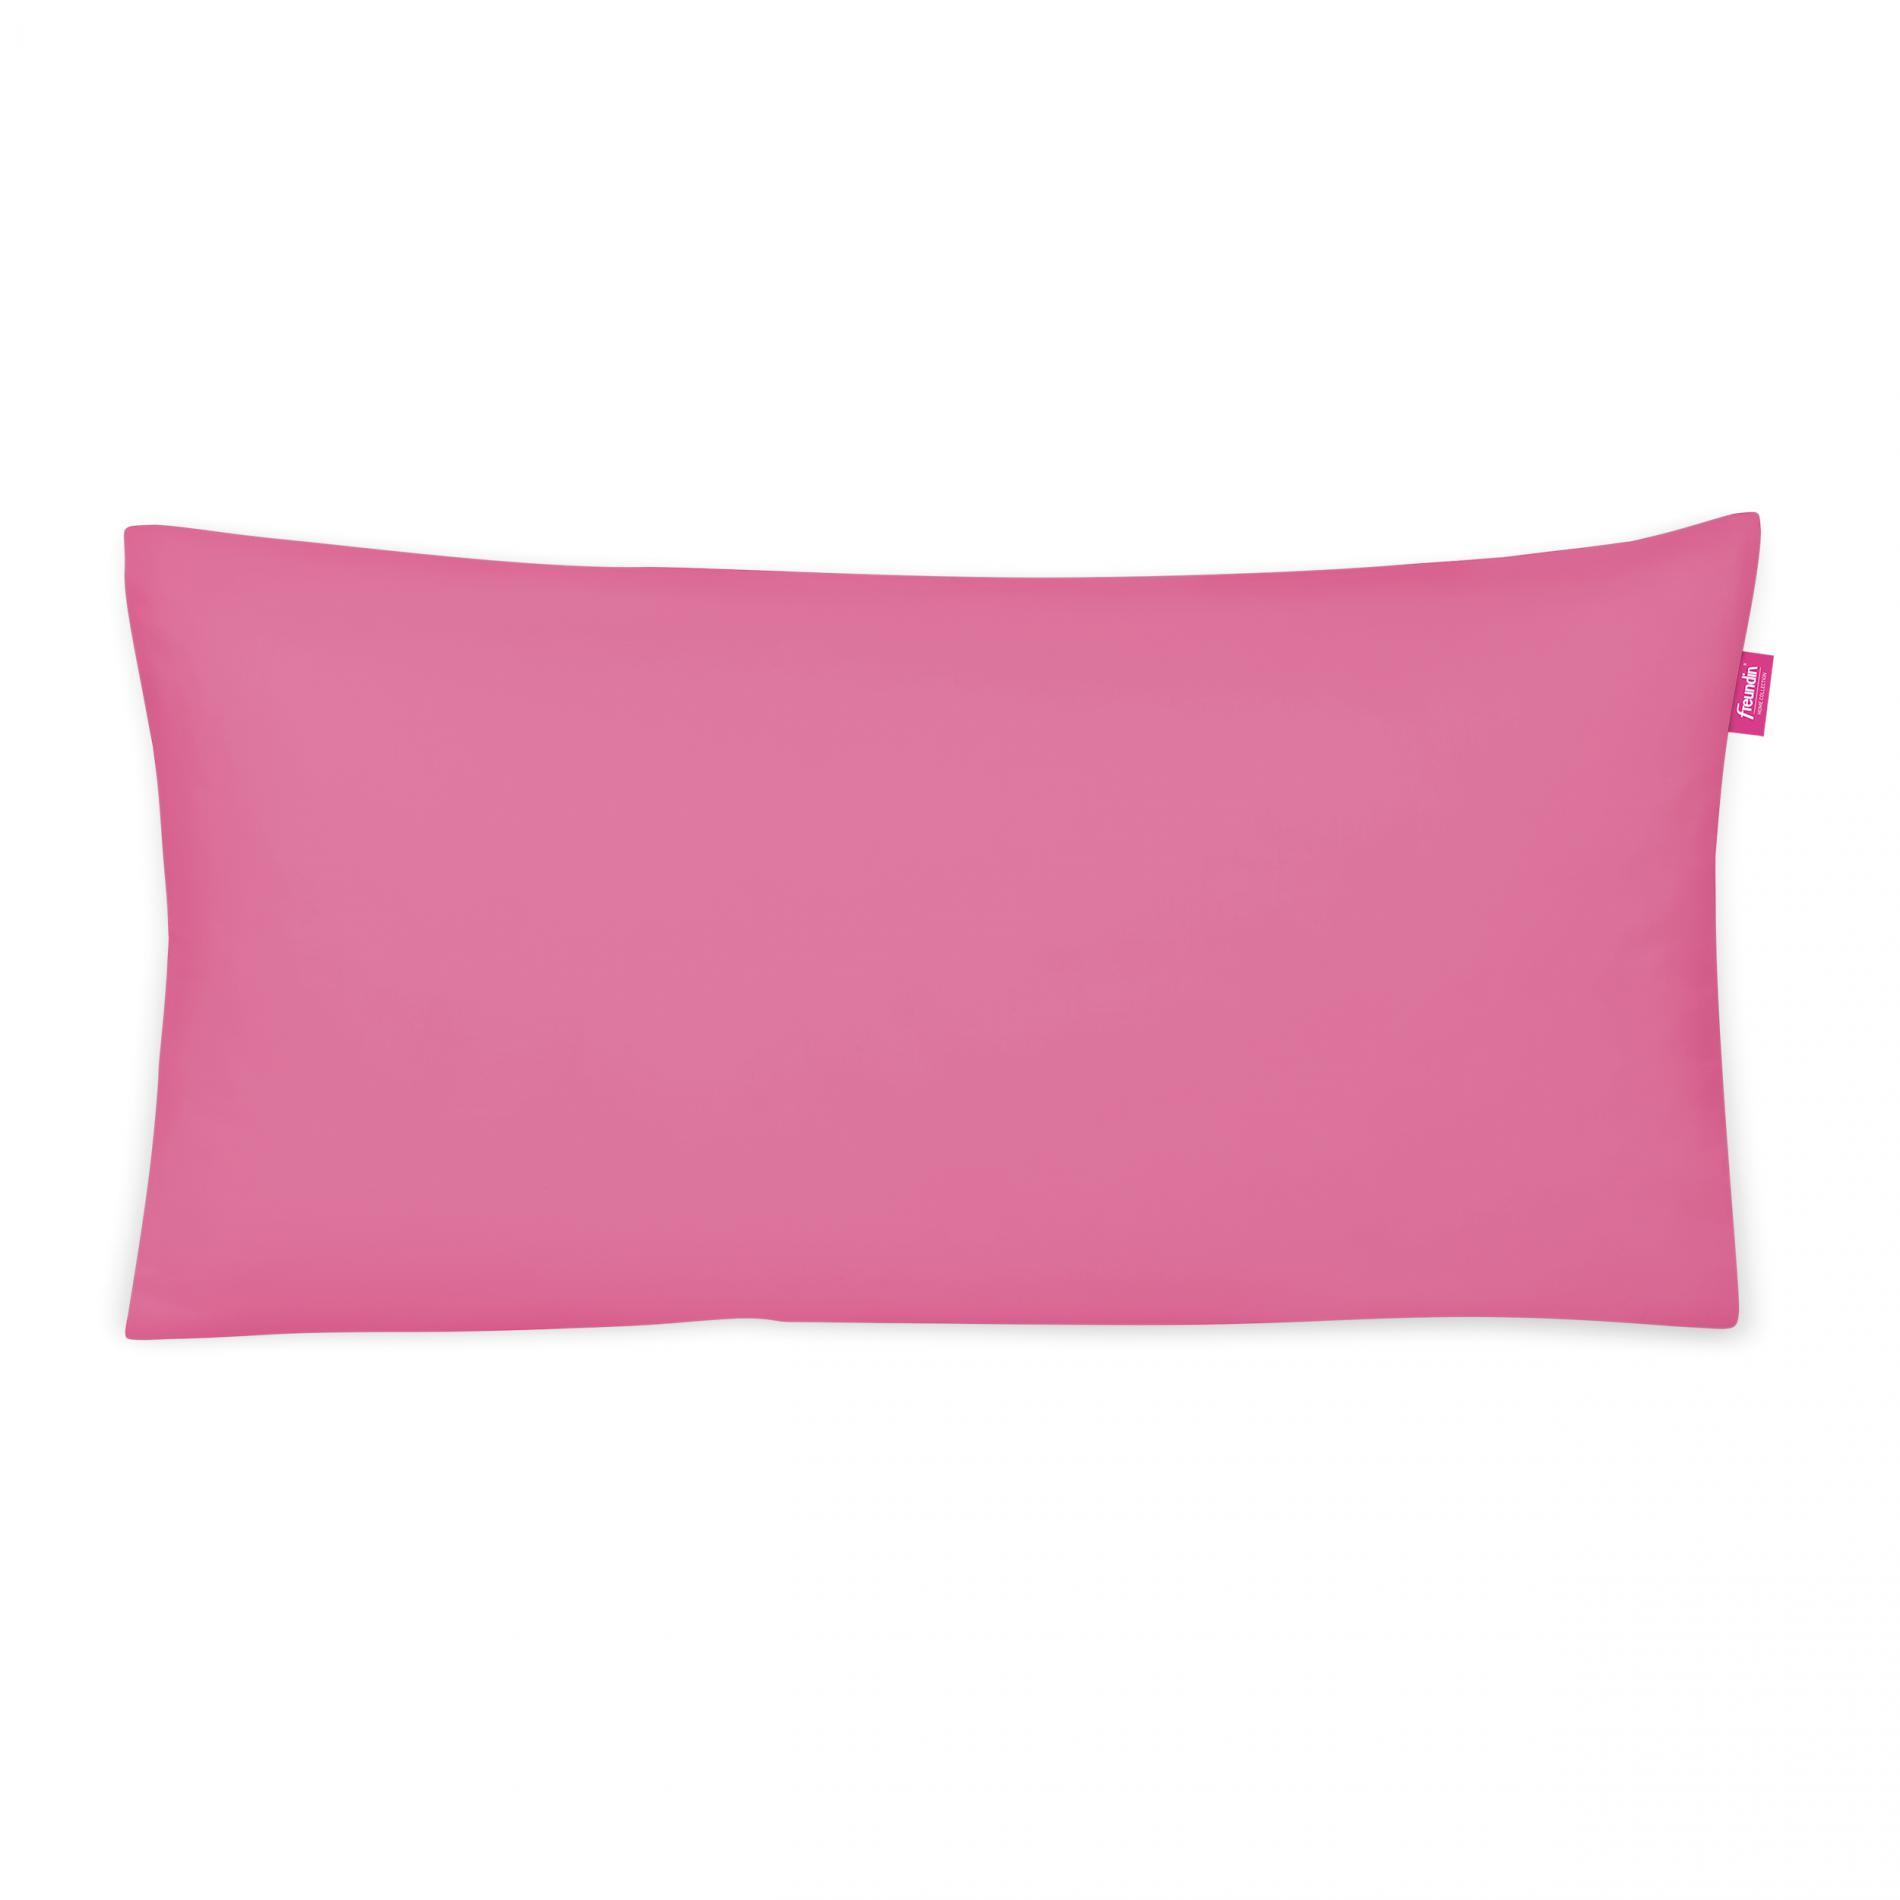 70 - pink